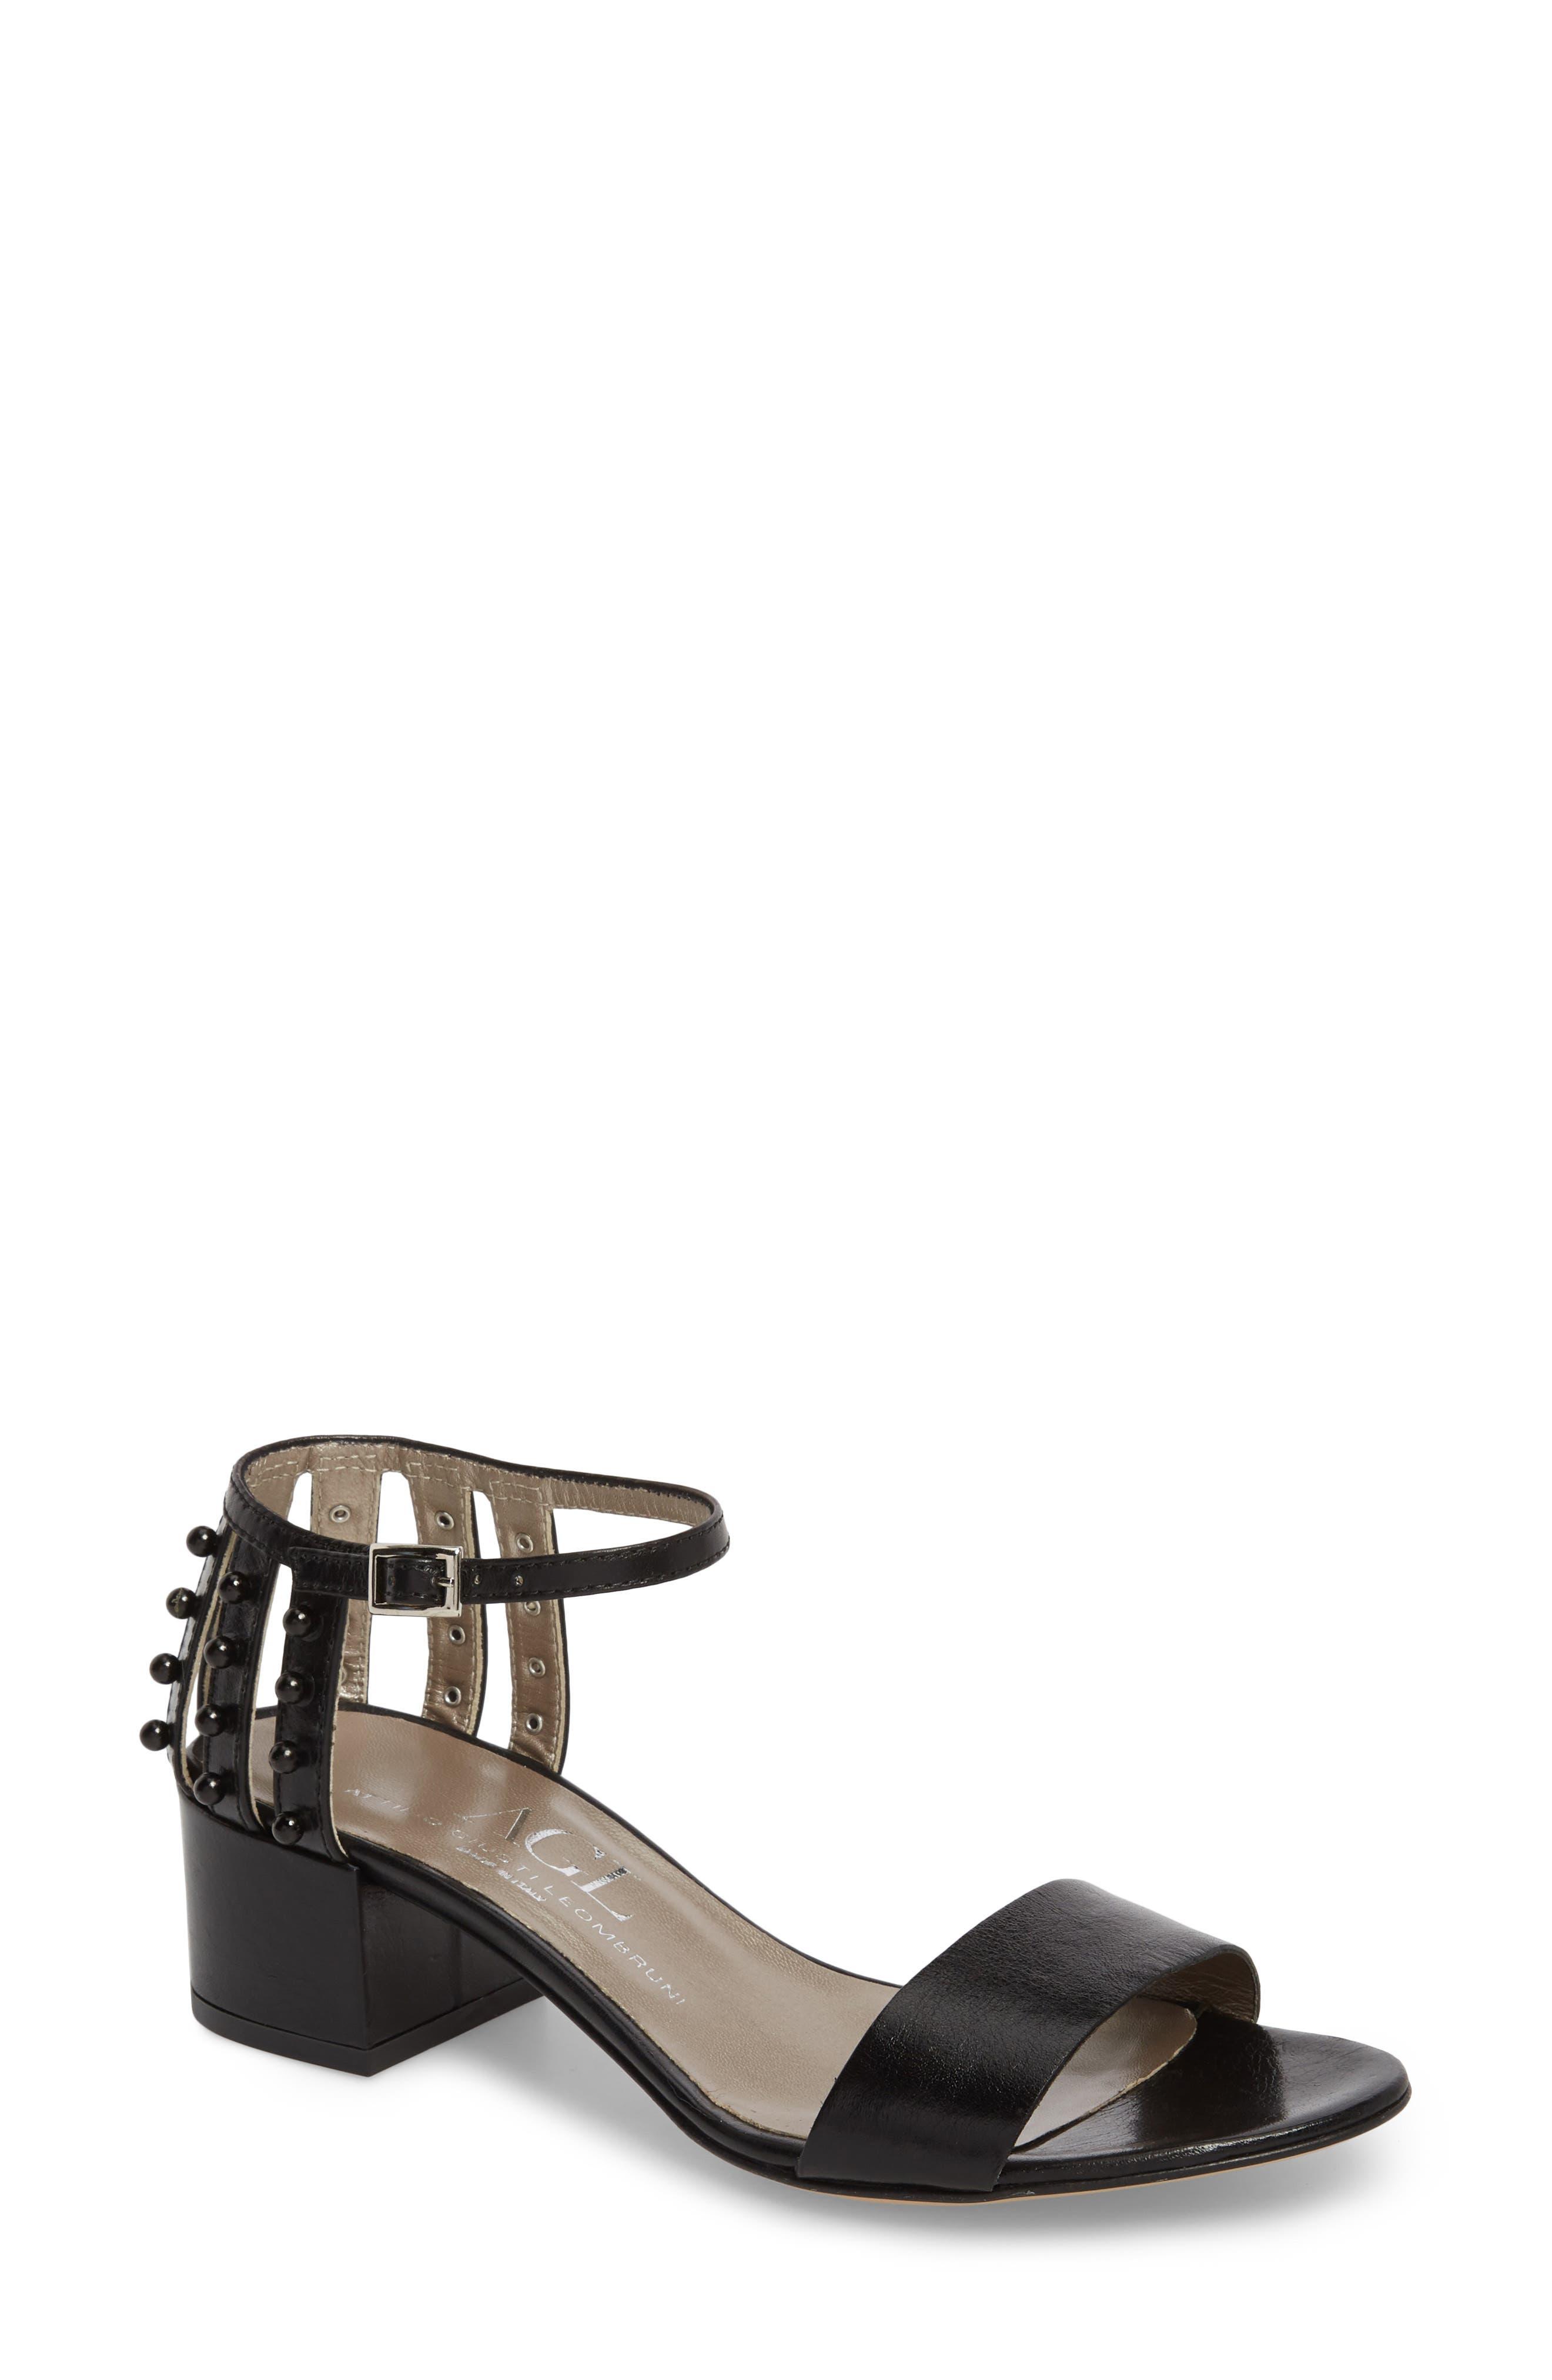 AGL ATTILIO GIUSTI LEOMBRUNI Women's Studded Block Heel Slide Sandal Gsb930v